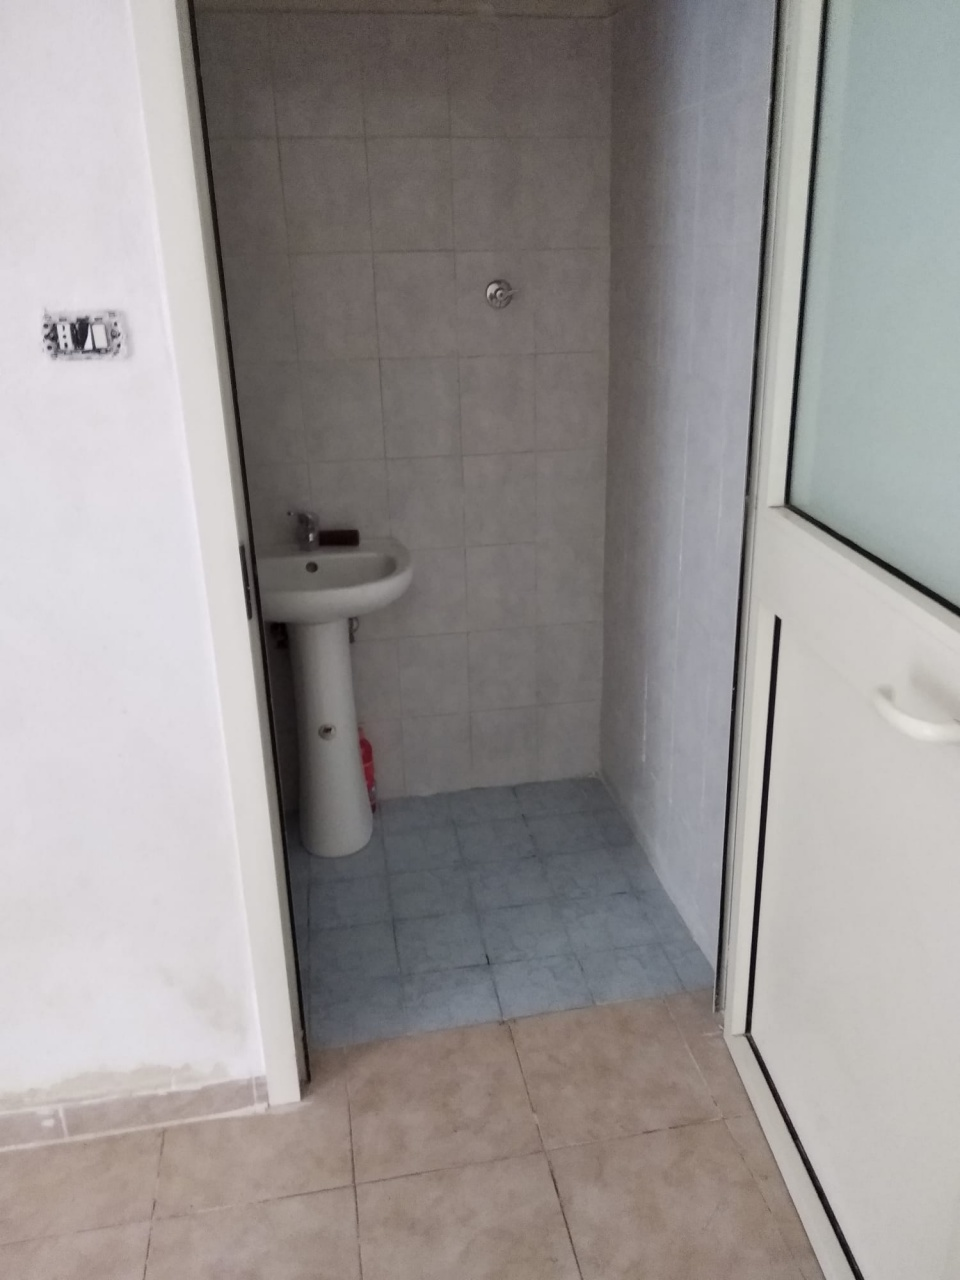 Locale commerciale monolocale in affitto a Pomigliano d'Arco (NA)